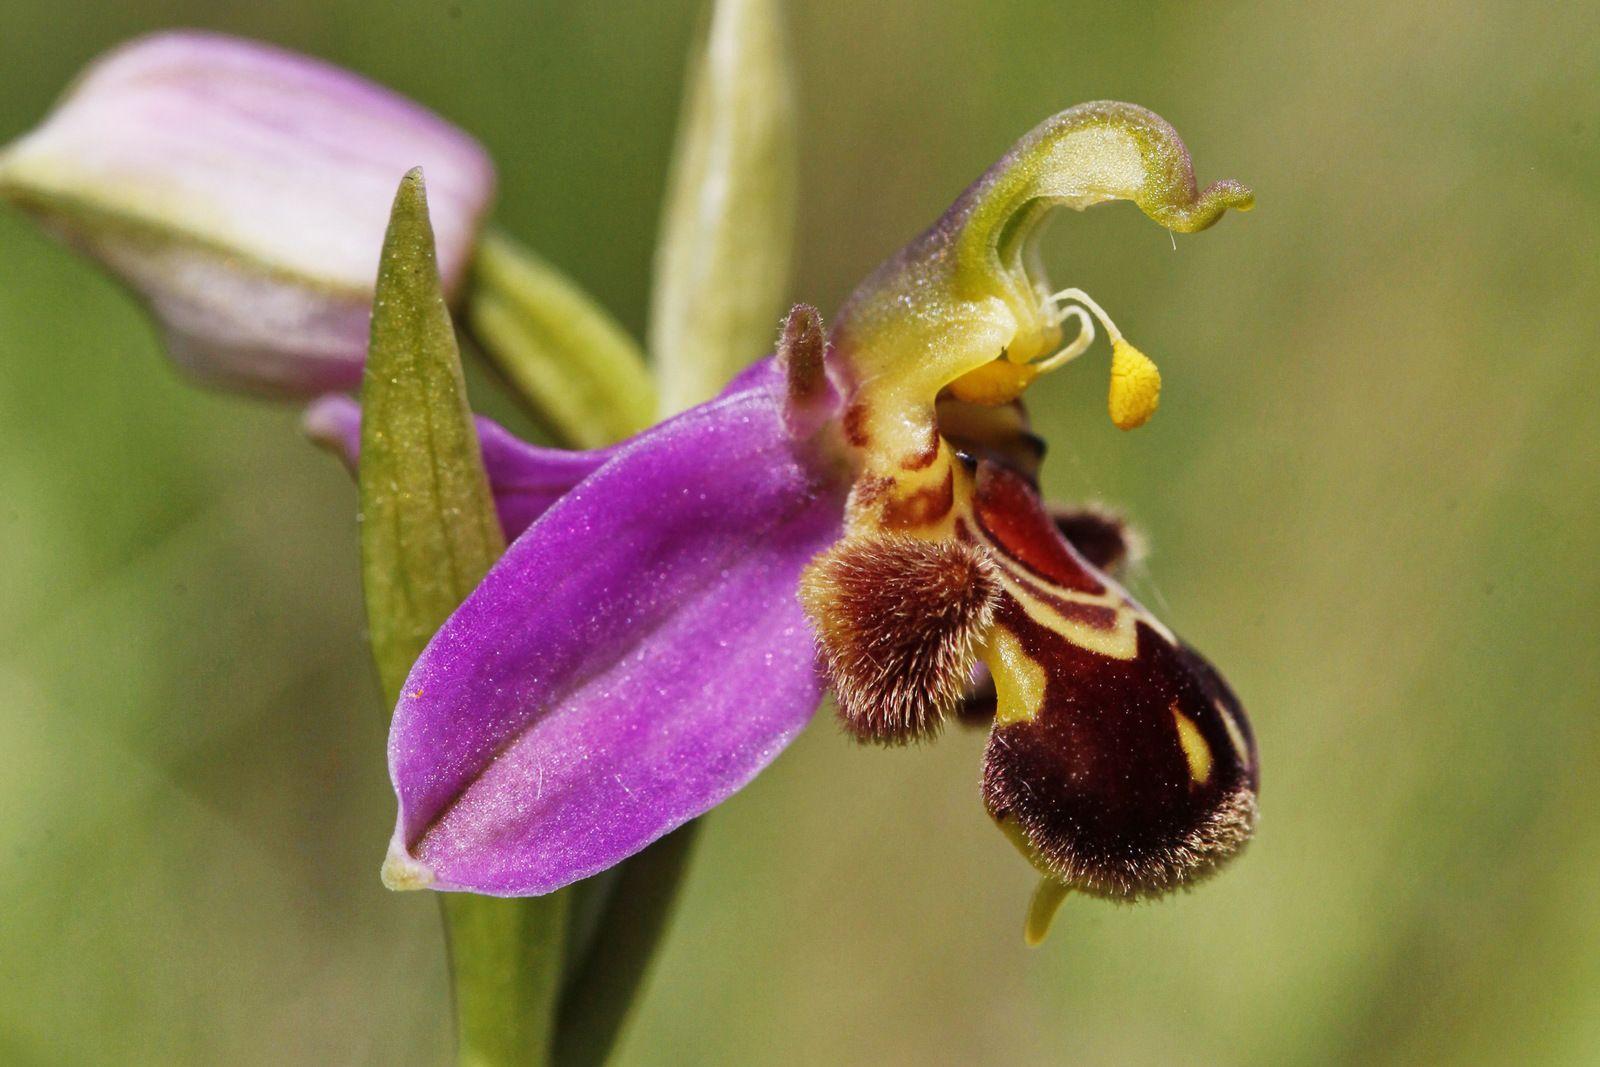 Ophrys apifera, Crozon, 23 mai 2020. Photographie lavieb-aile.